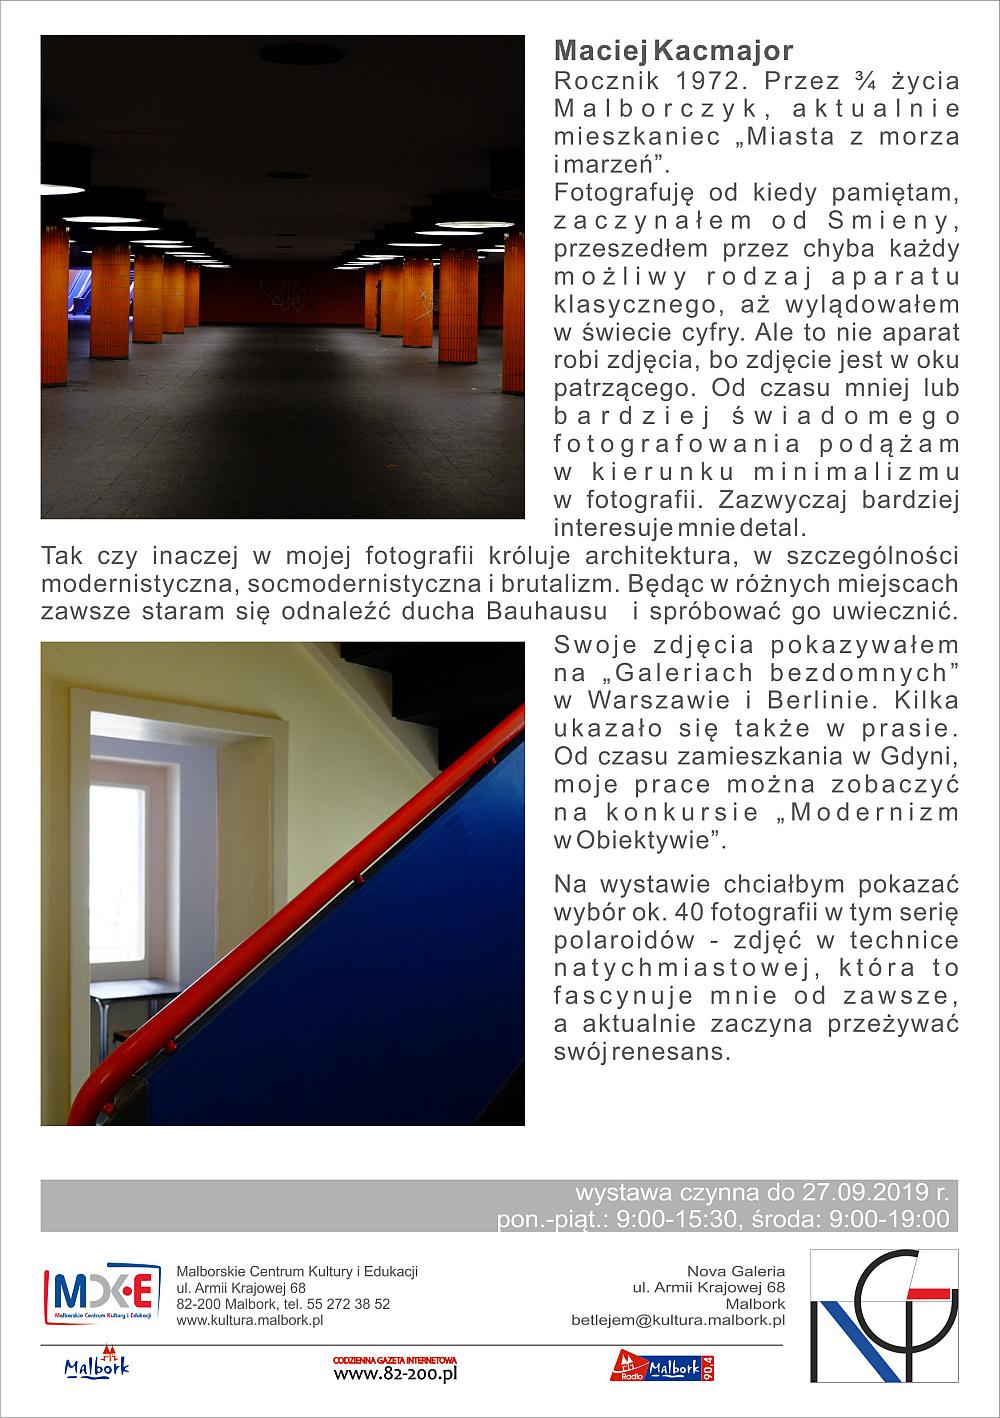 http://m.82-200.pl/2019/09/orig/zaproszeniemaciejkacmajorstr2-4859.jpg